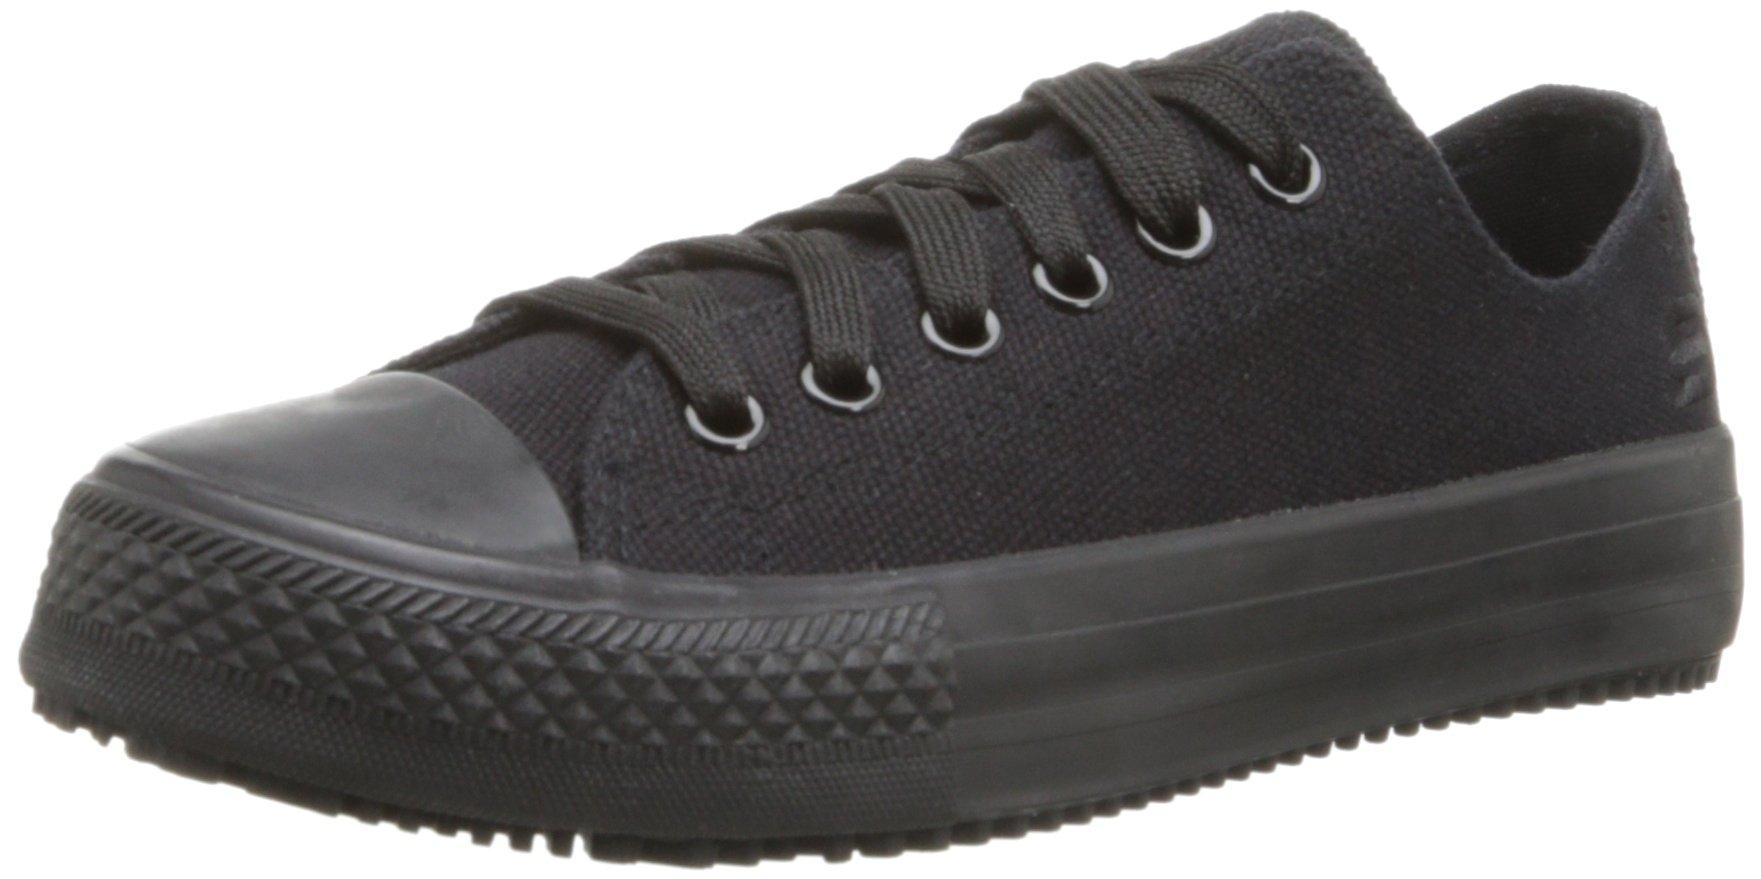 Skechers Work Women's Gibson Arias Slip Resistant Work Shoe, Black, 9.5 M US